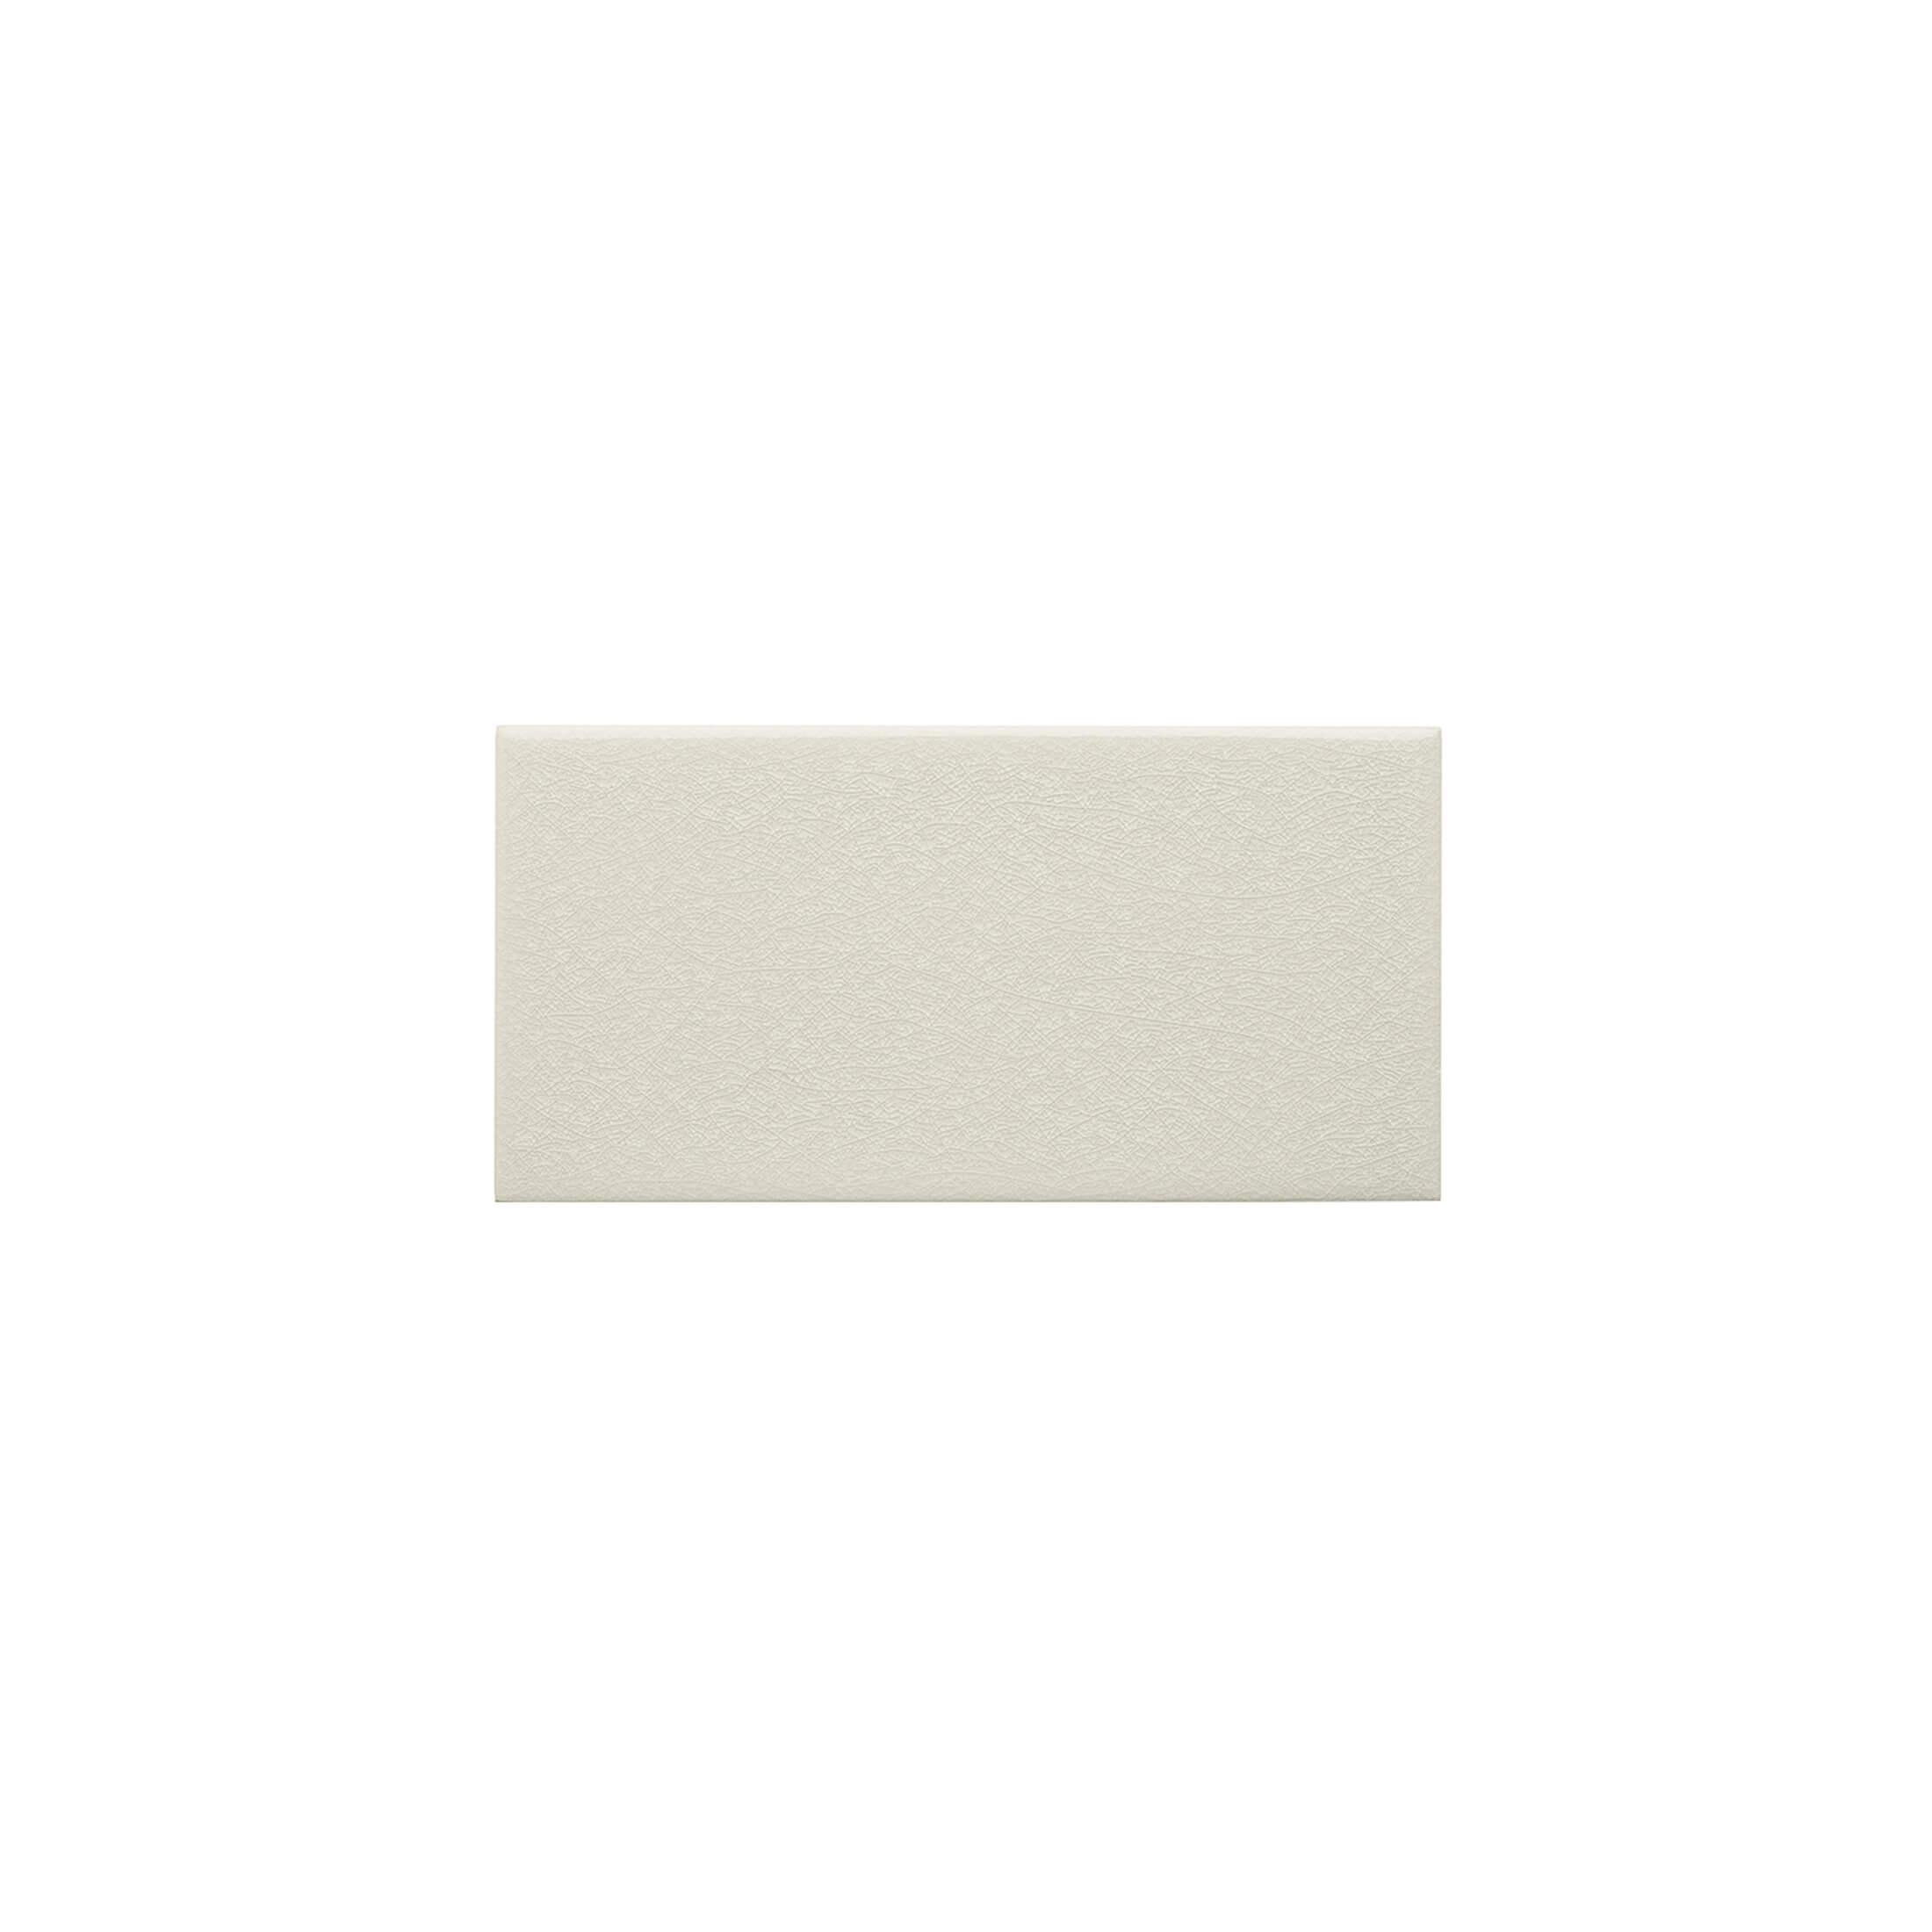 ADOC1002 - LISO  - 7.5 cm X 15 cm